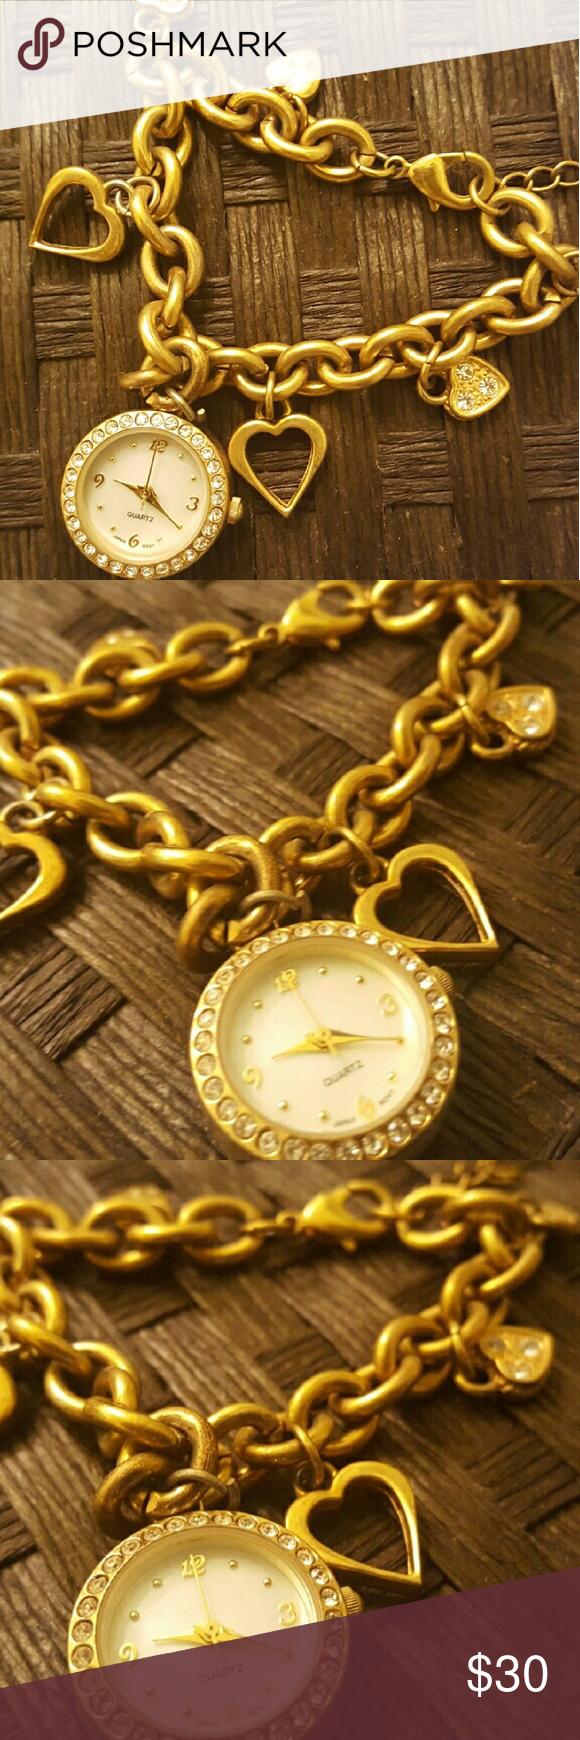 Charm watch/bracelet Gold Vintage style looks great on Jewelry Bracelets